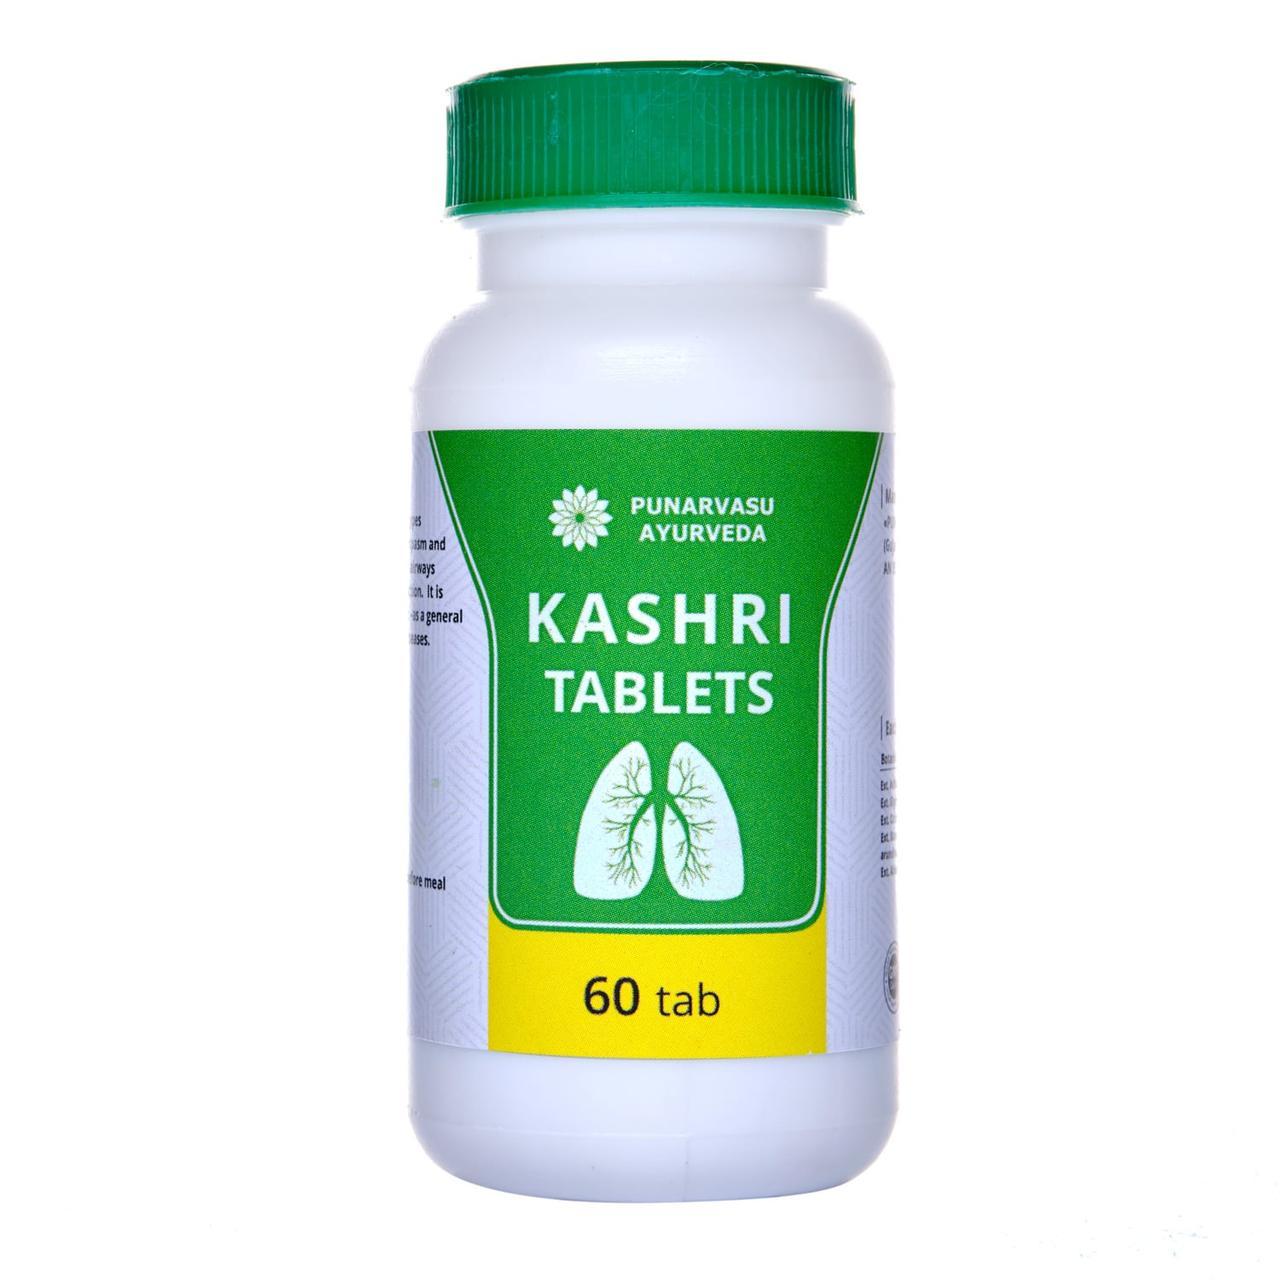 Кашри / Kashri - при простуде, кашле, астме, бронхите - Пунарвасу - 60 таб